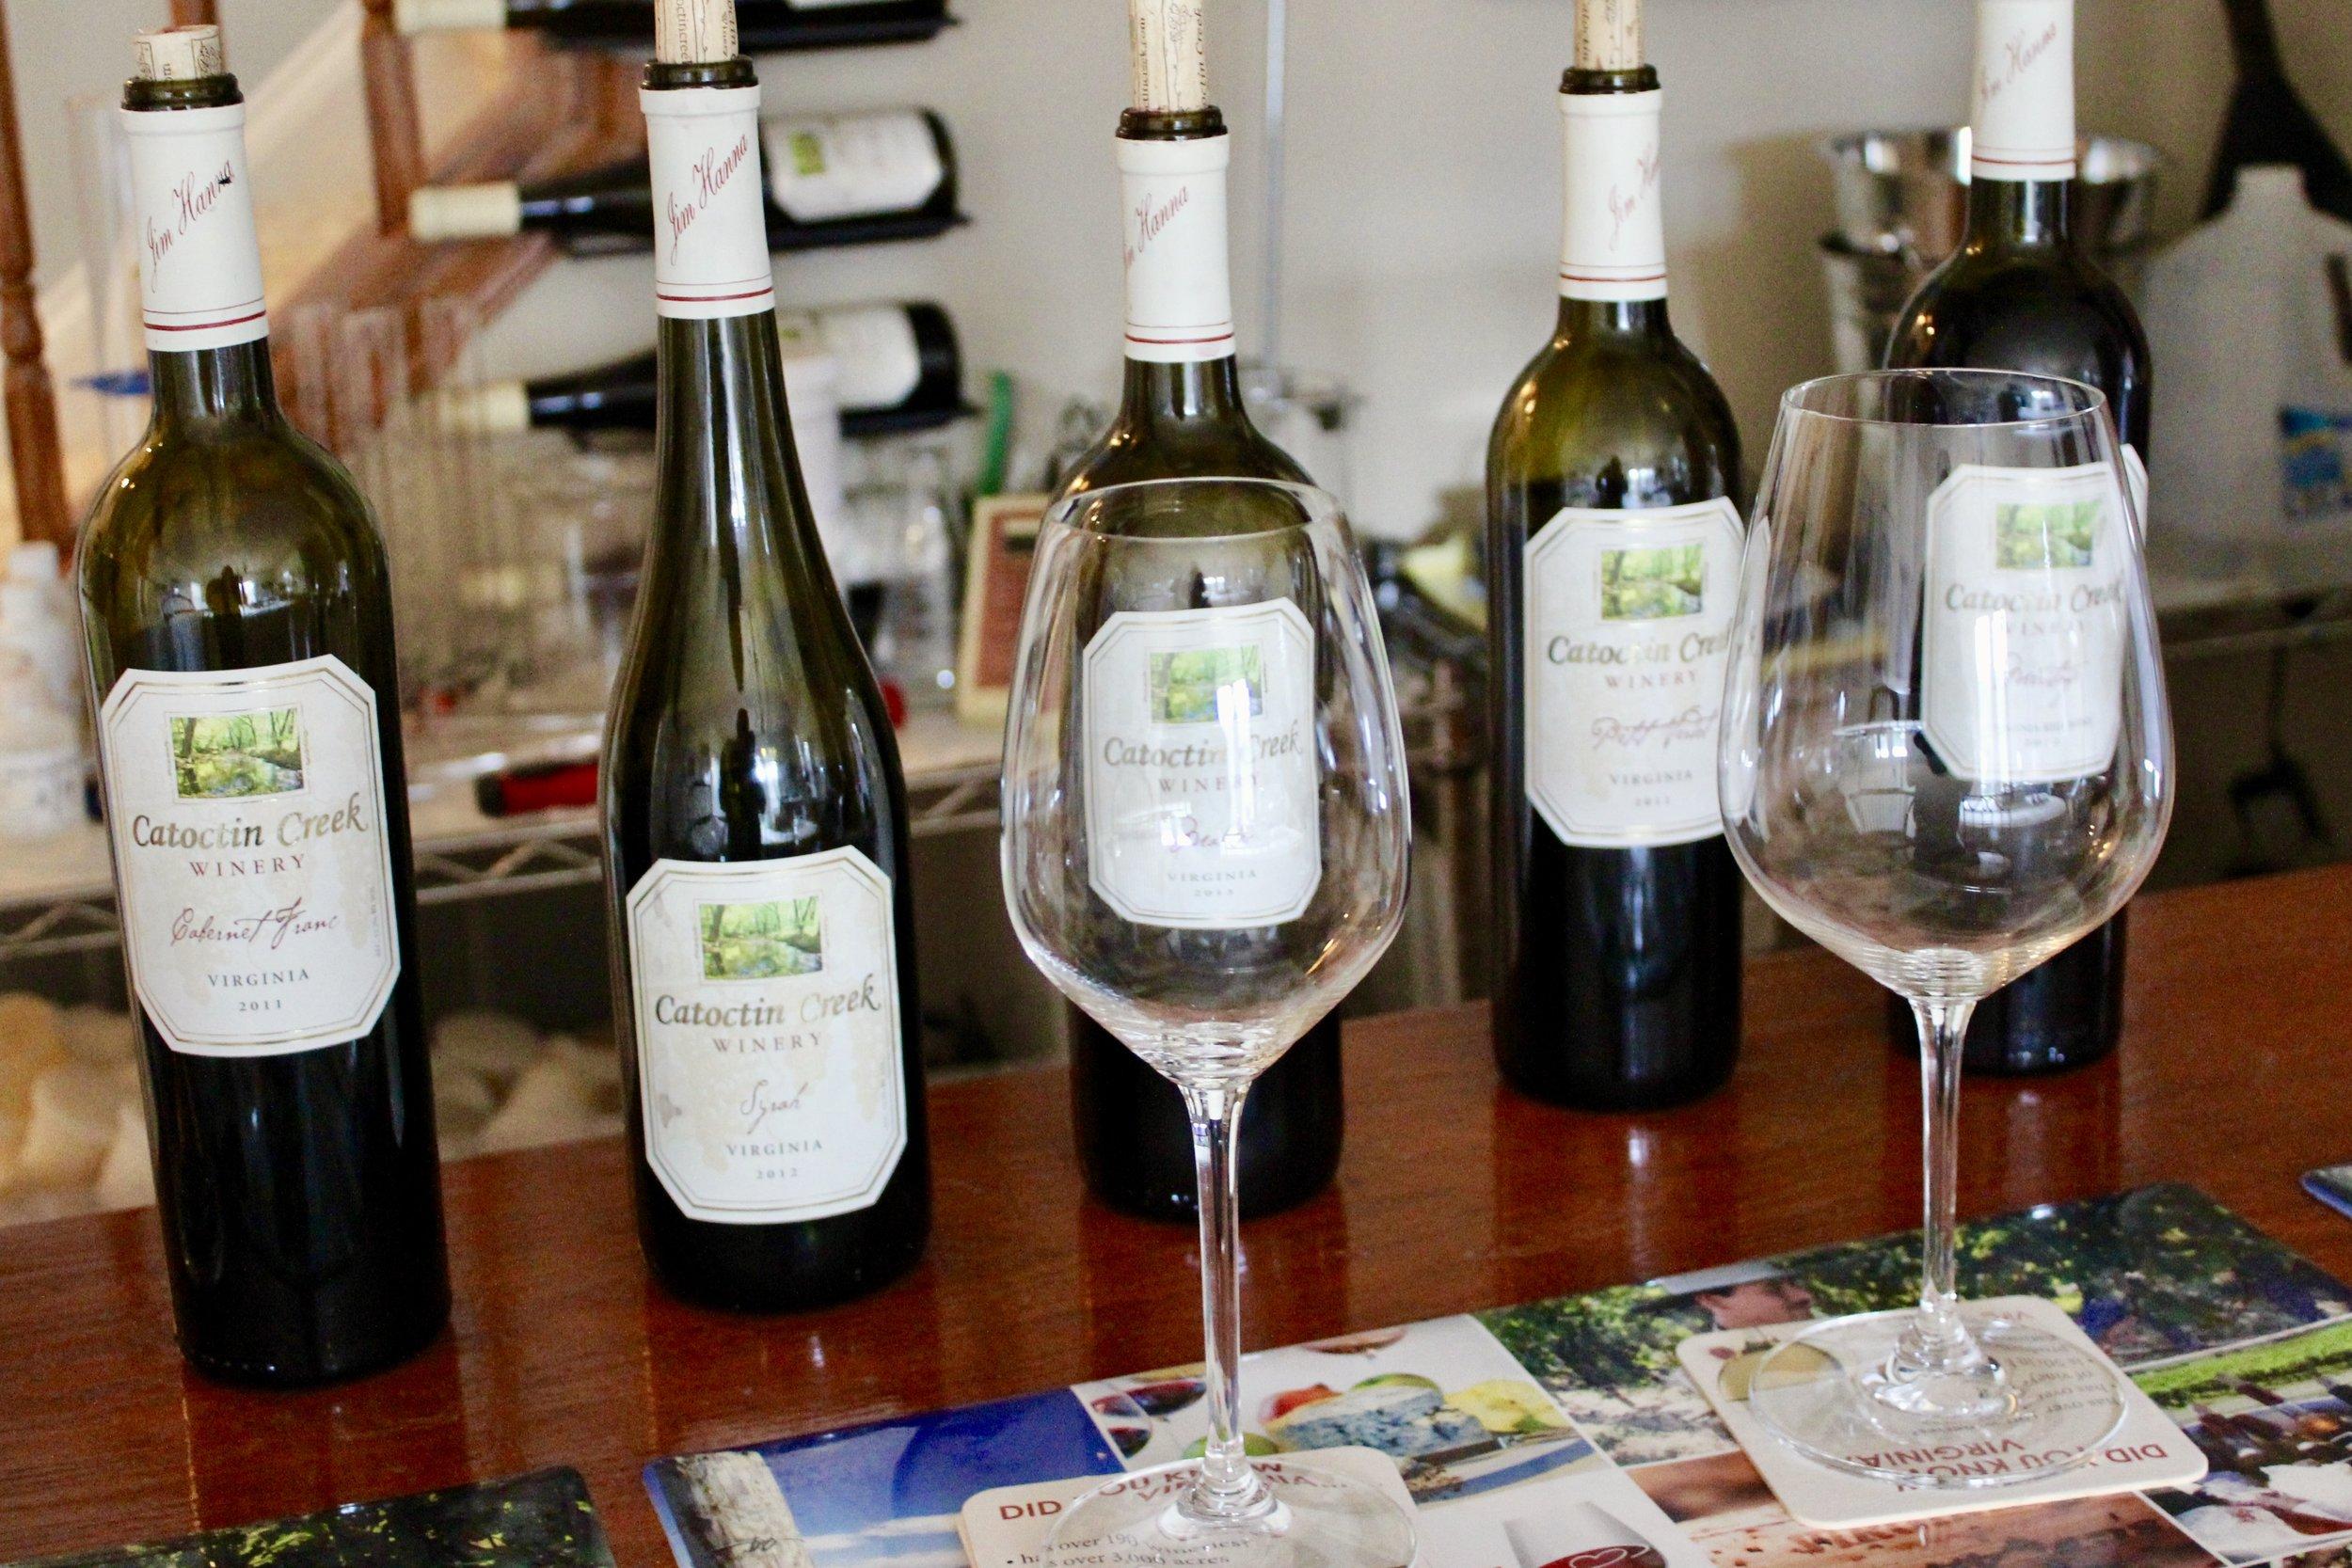 Catoctin Creek Winery